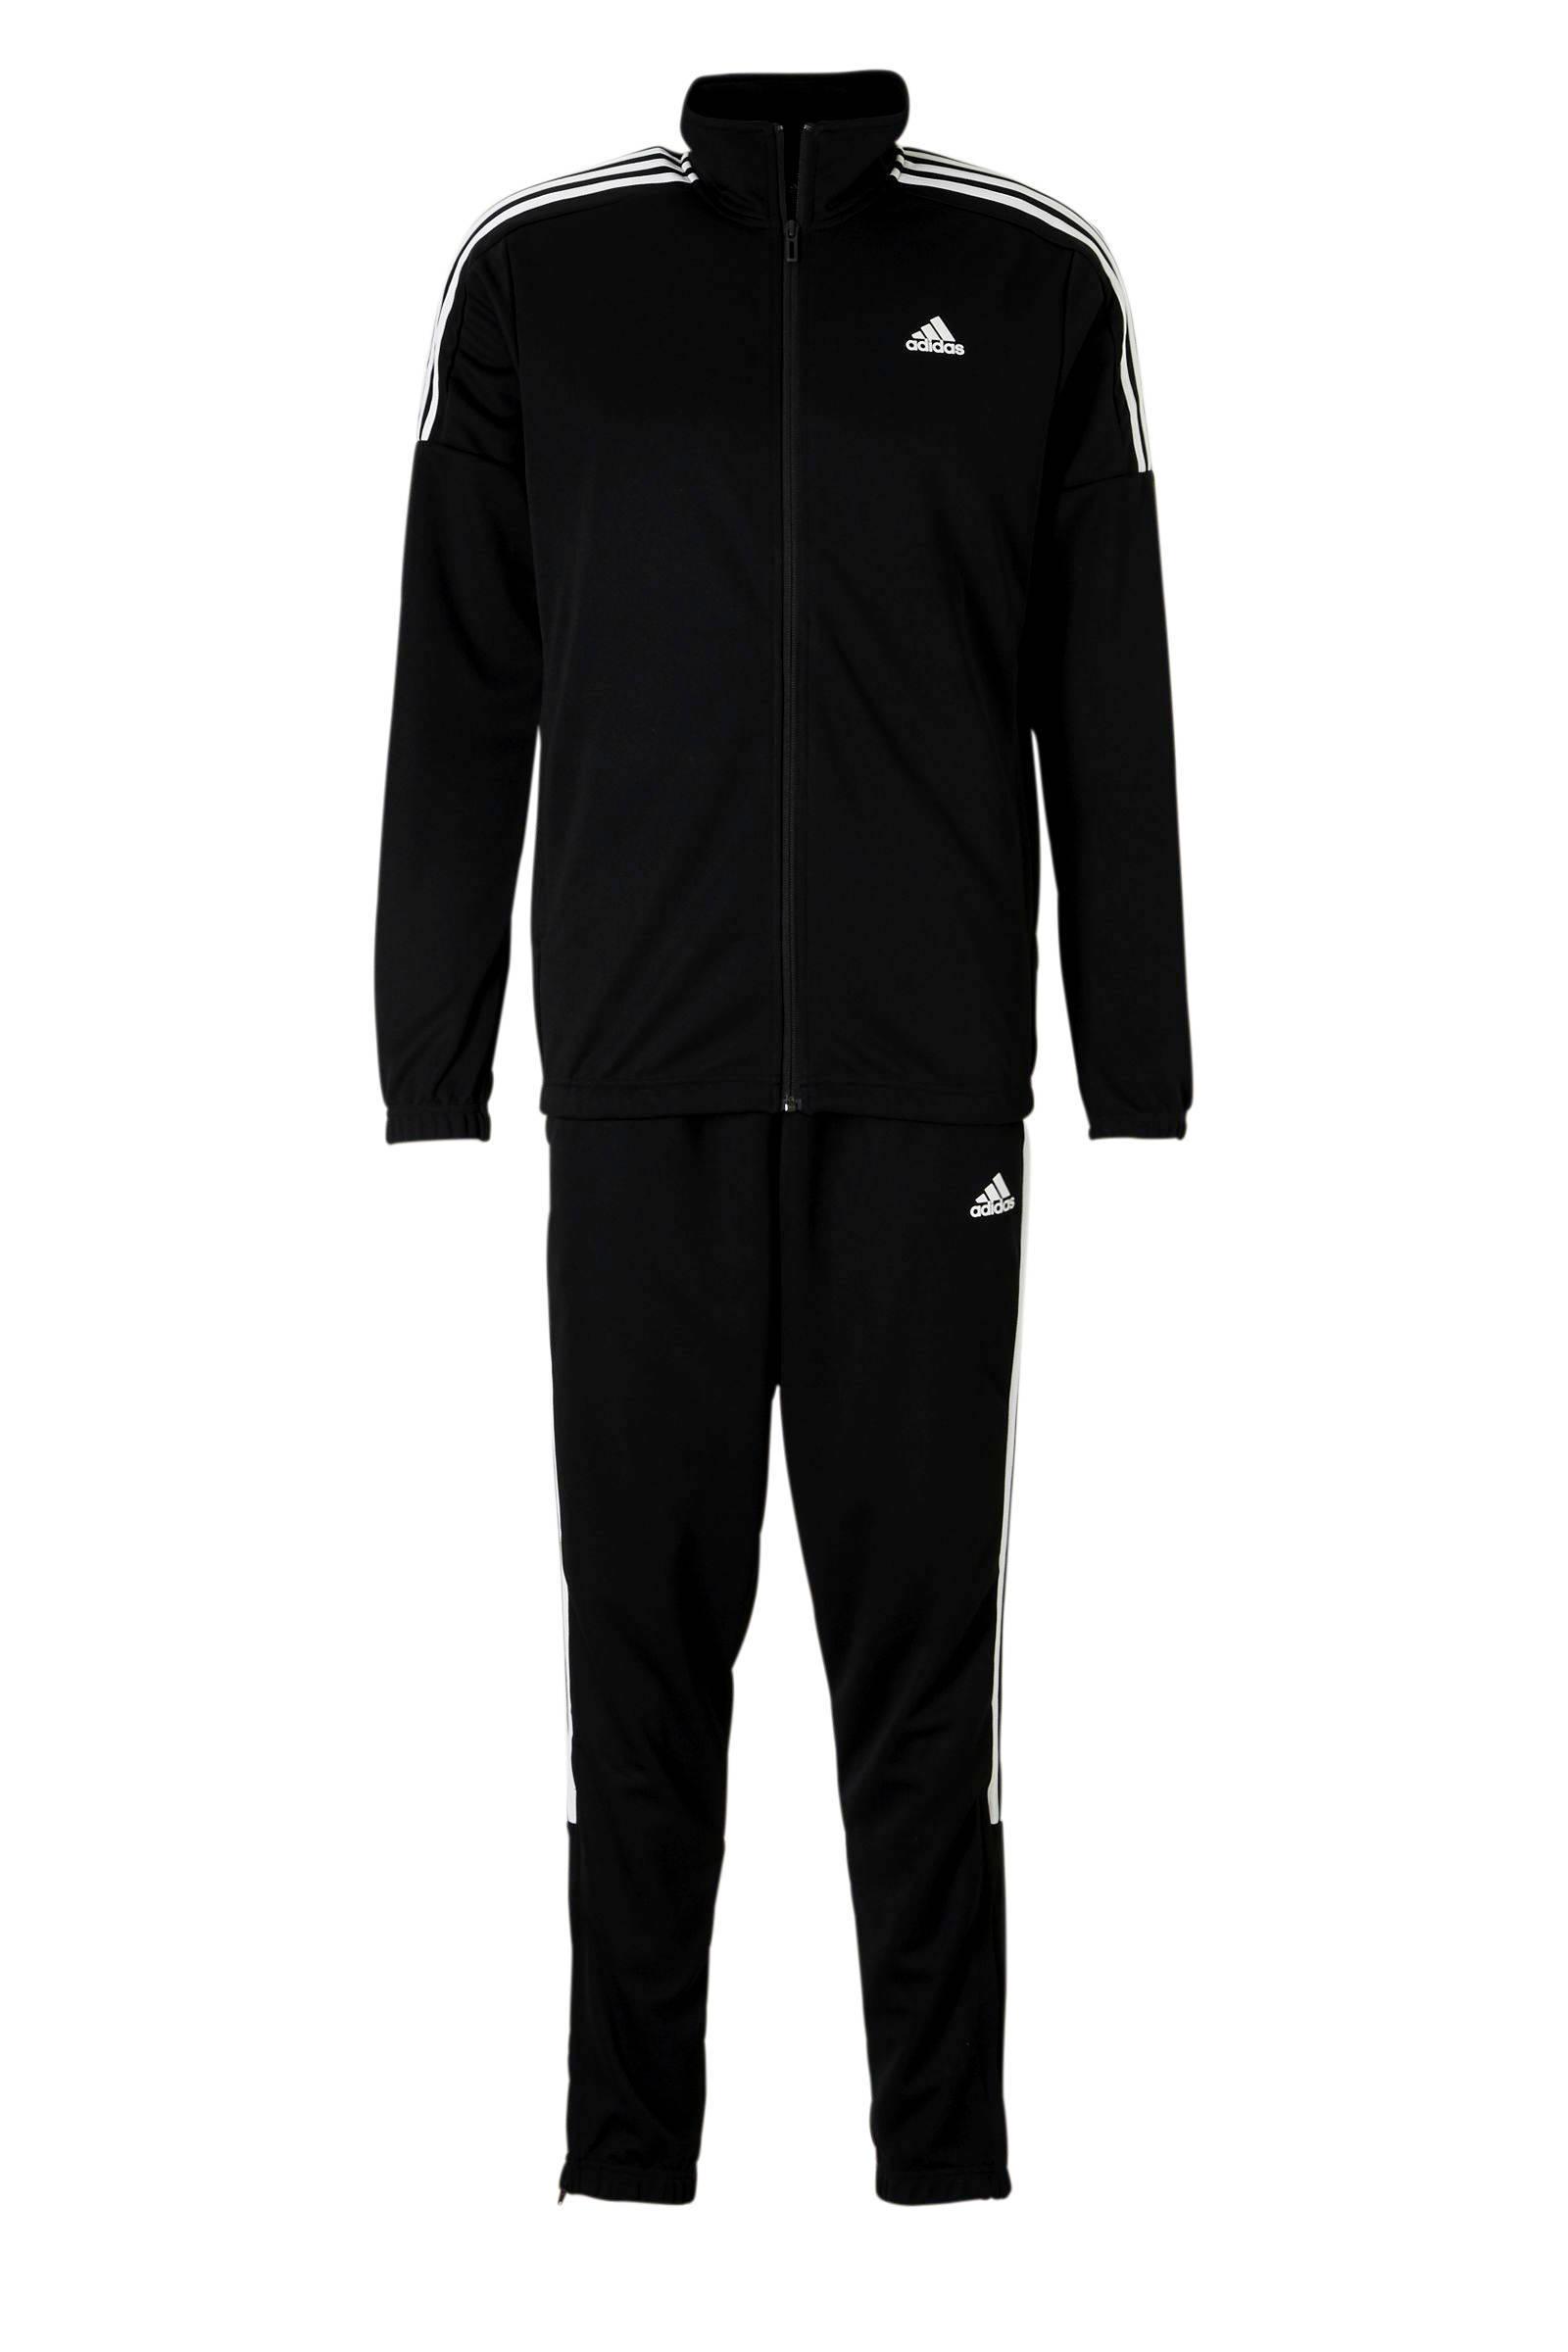 adidas Performance trainingspak zwart | wehkamp